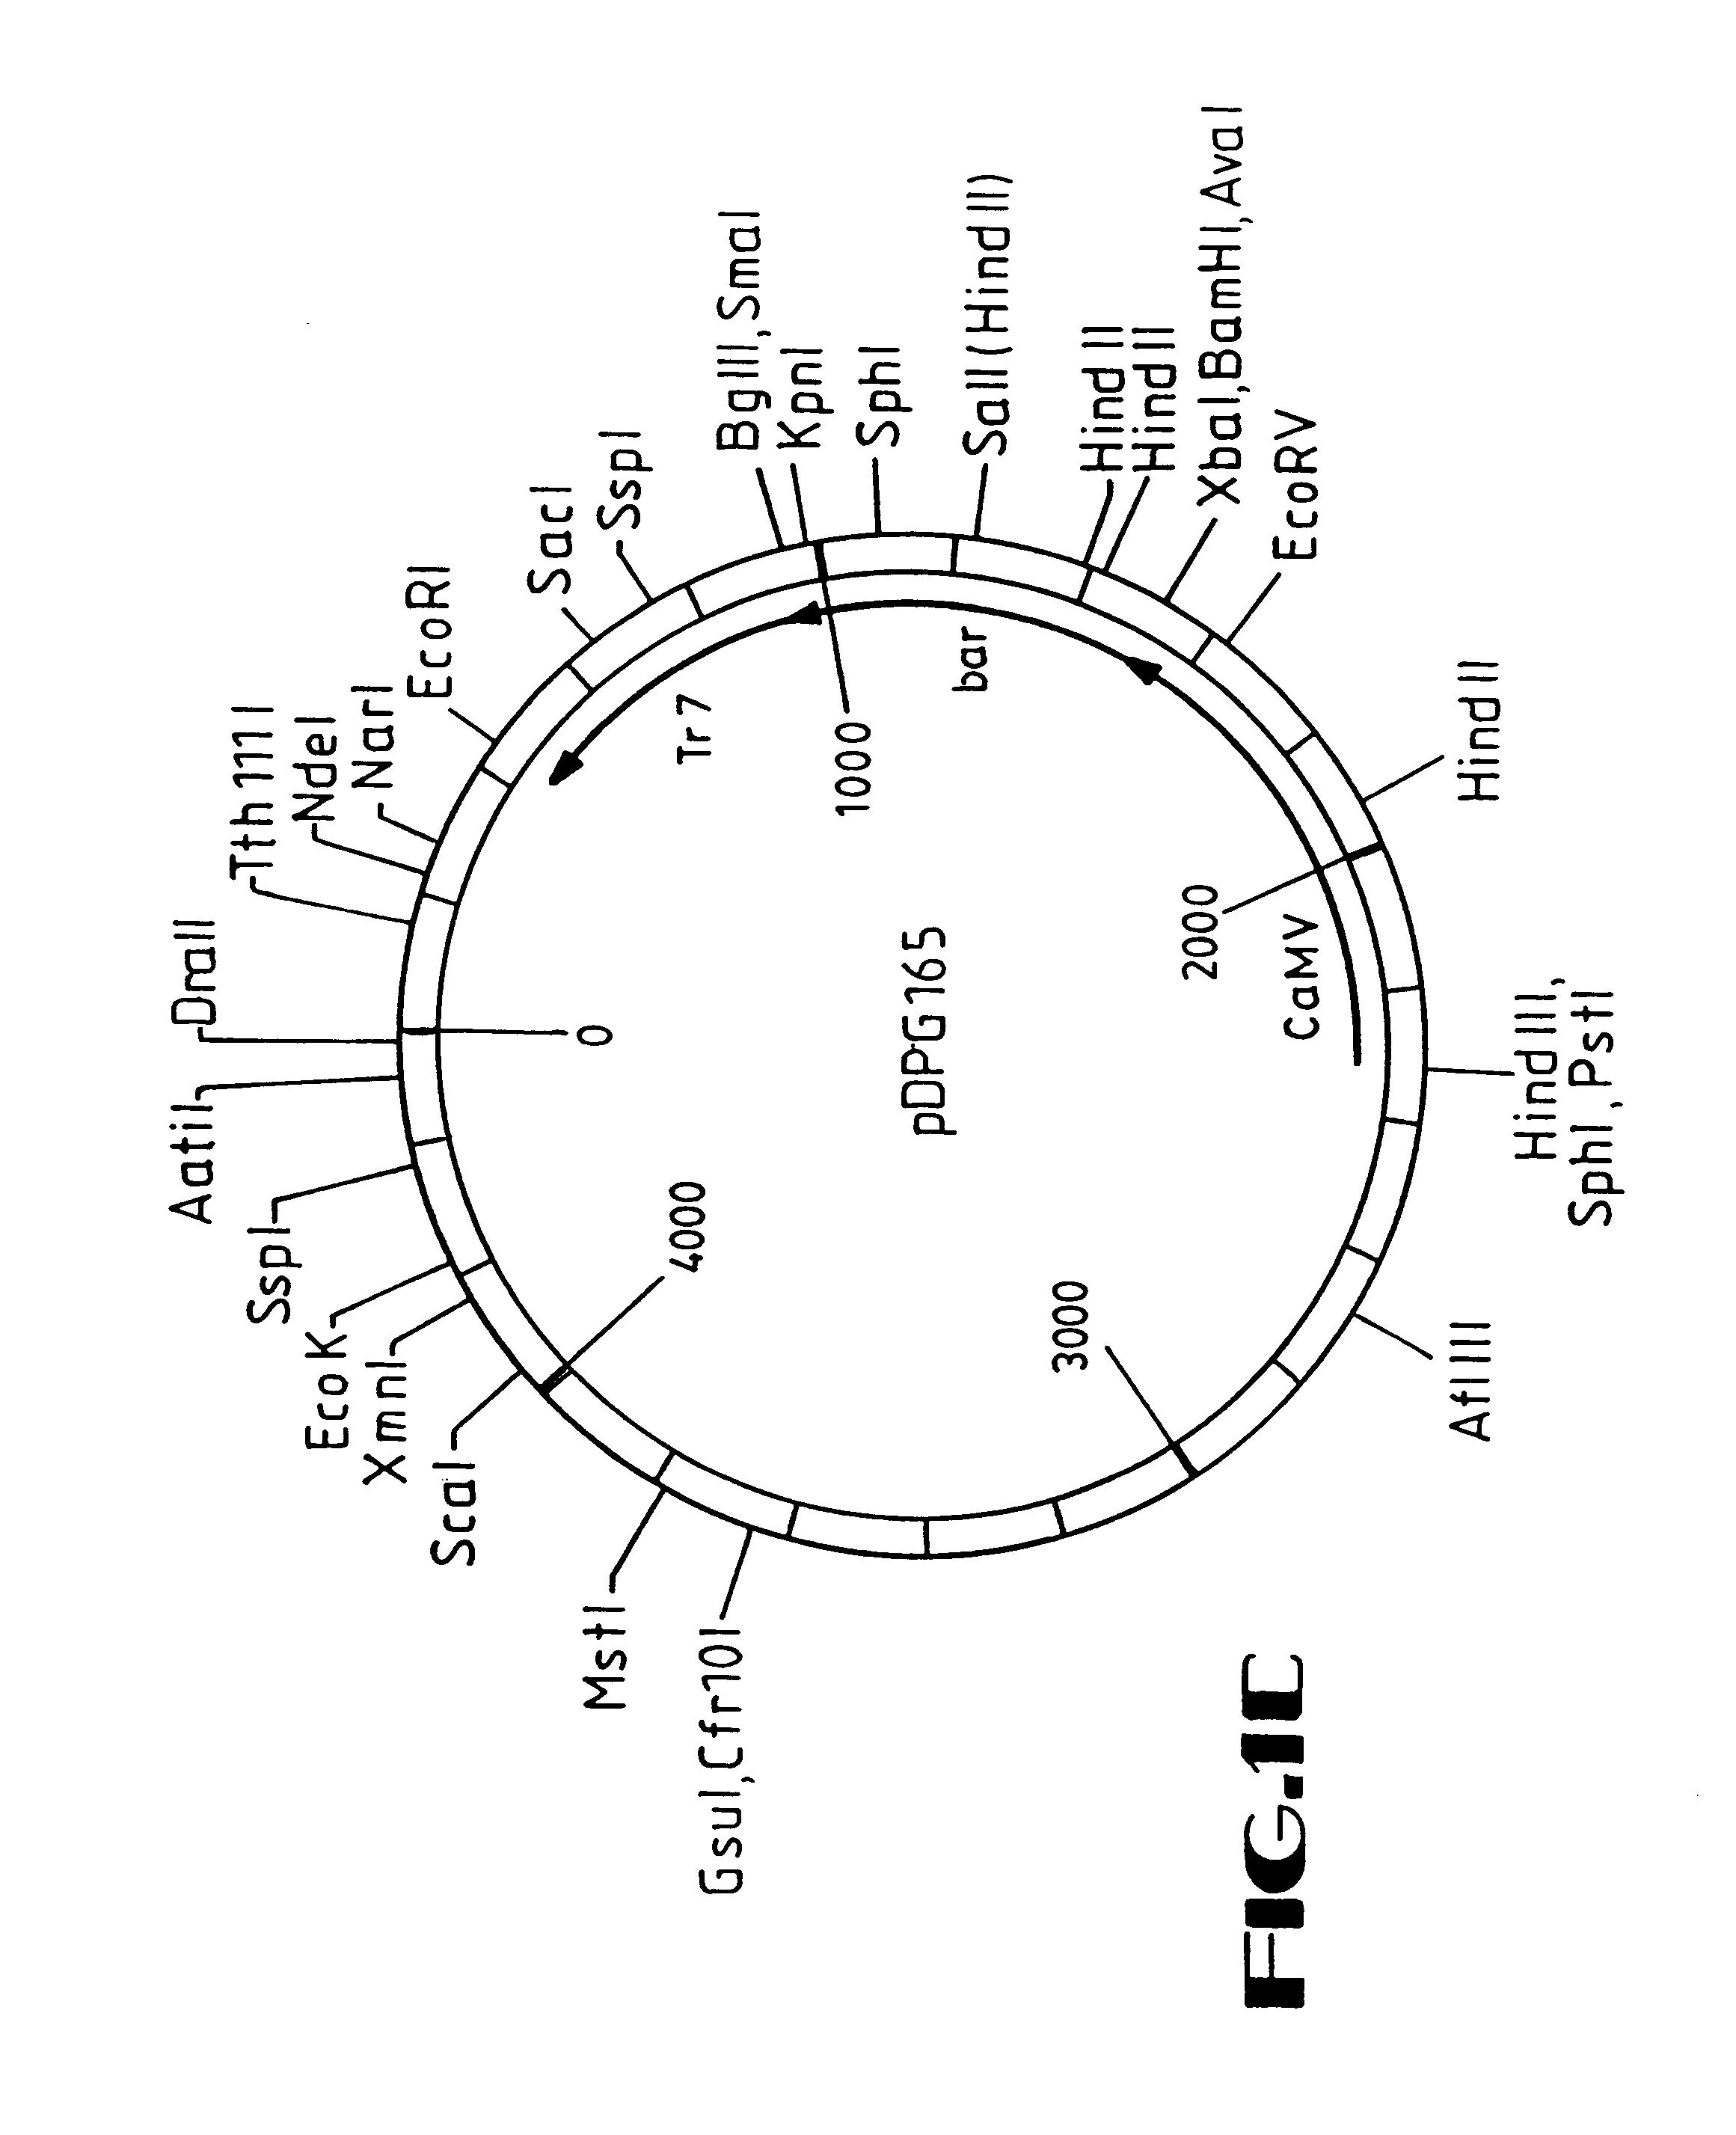 pioneer deh p3700mp wiring diagram